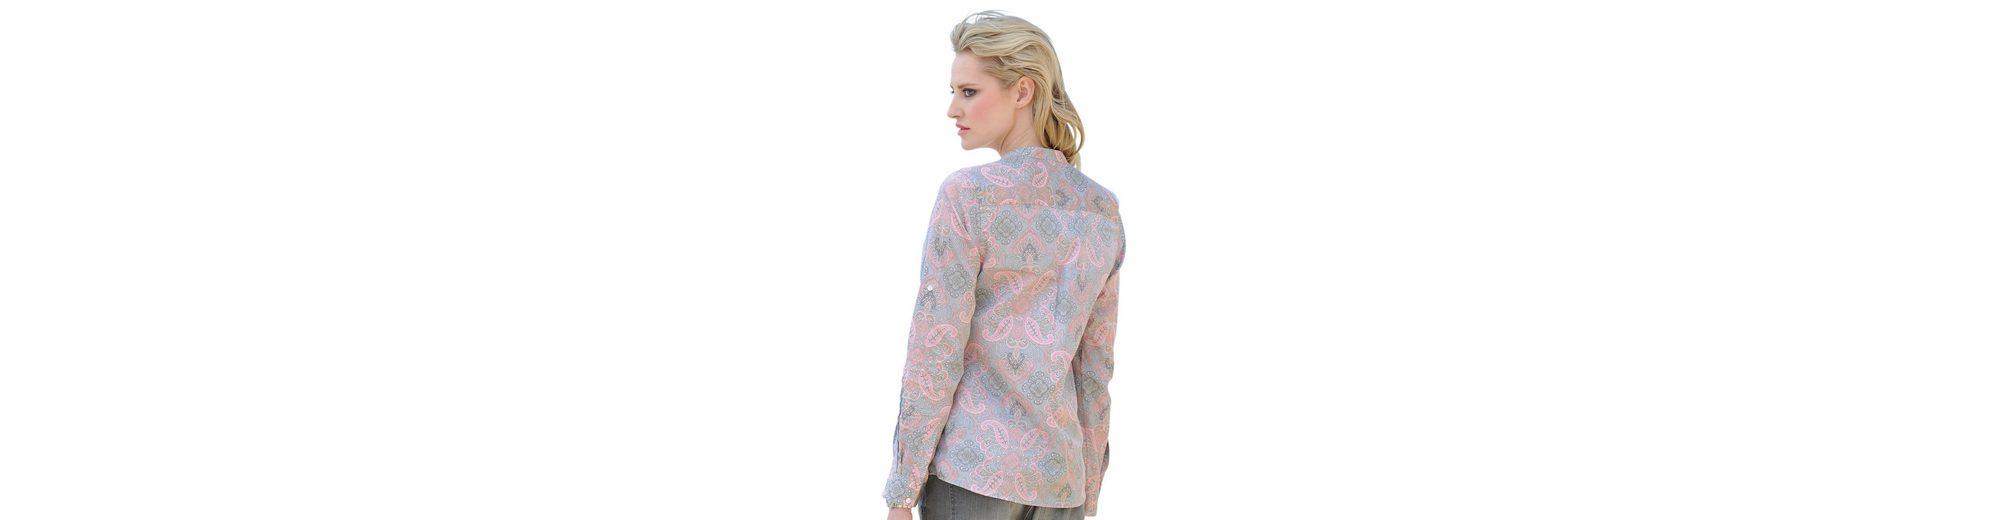 Alba Moda Bluse im Paisleyprint Rabatt Hohe Qualität Neueste Online-Verkauf jjuS8I